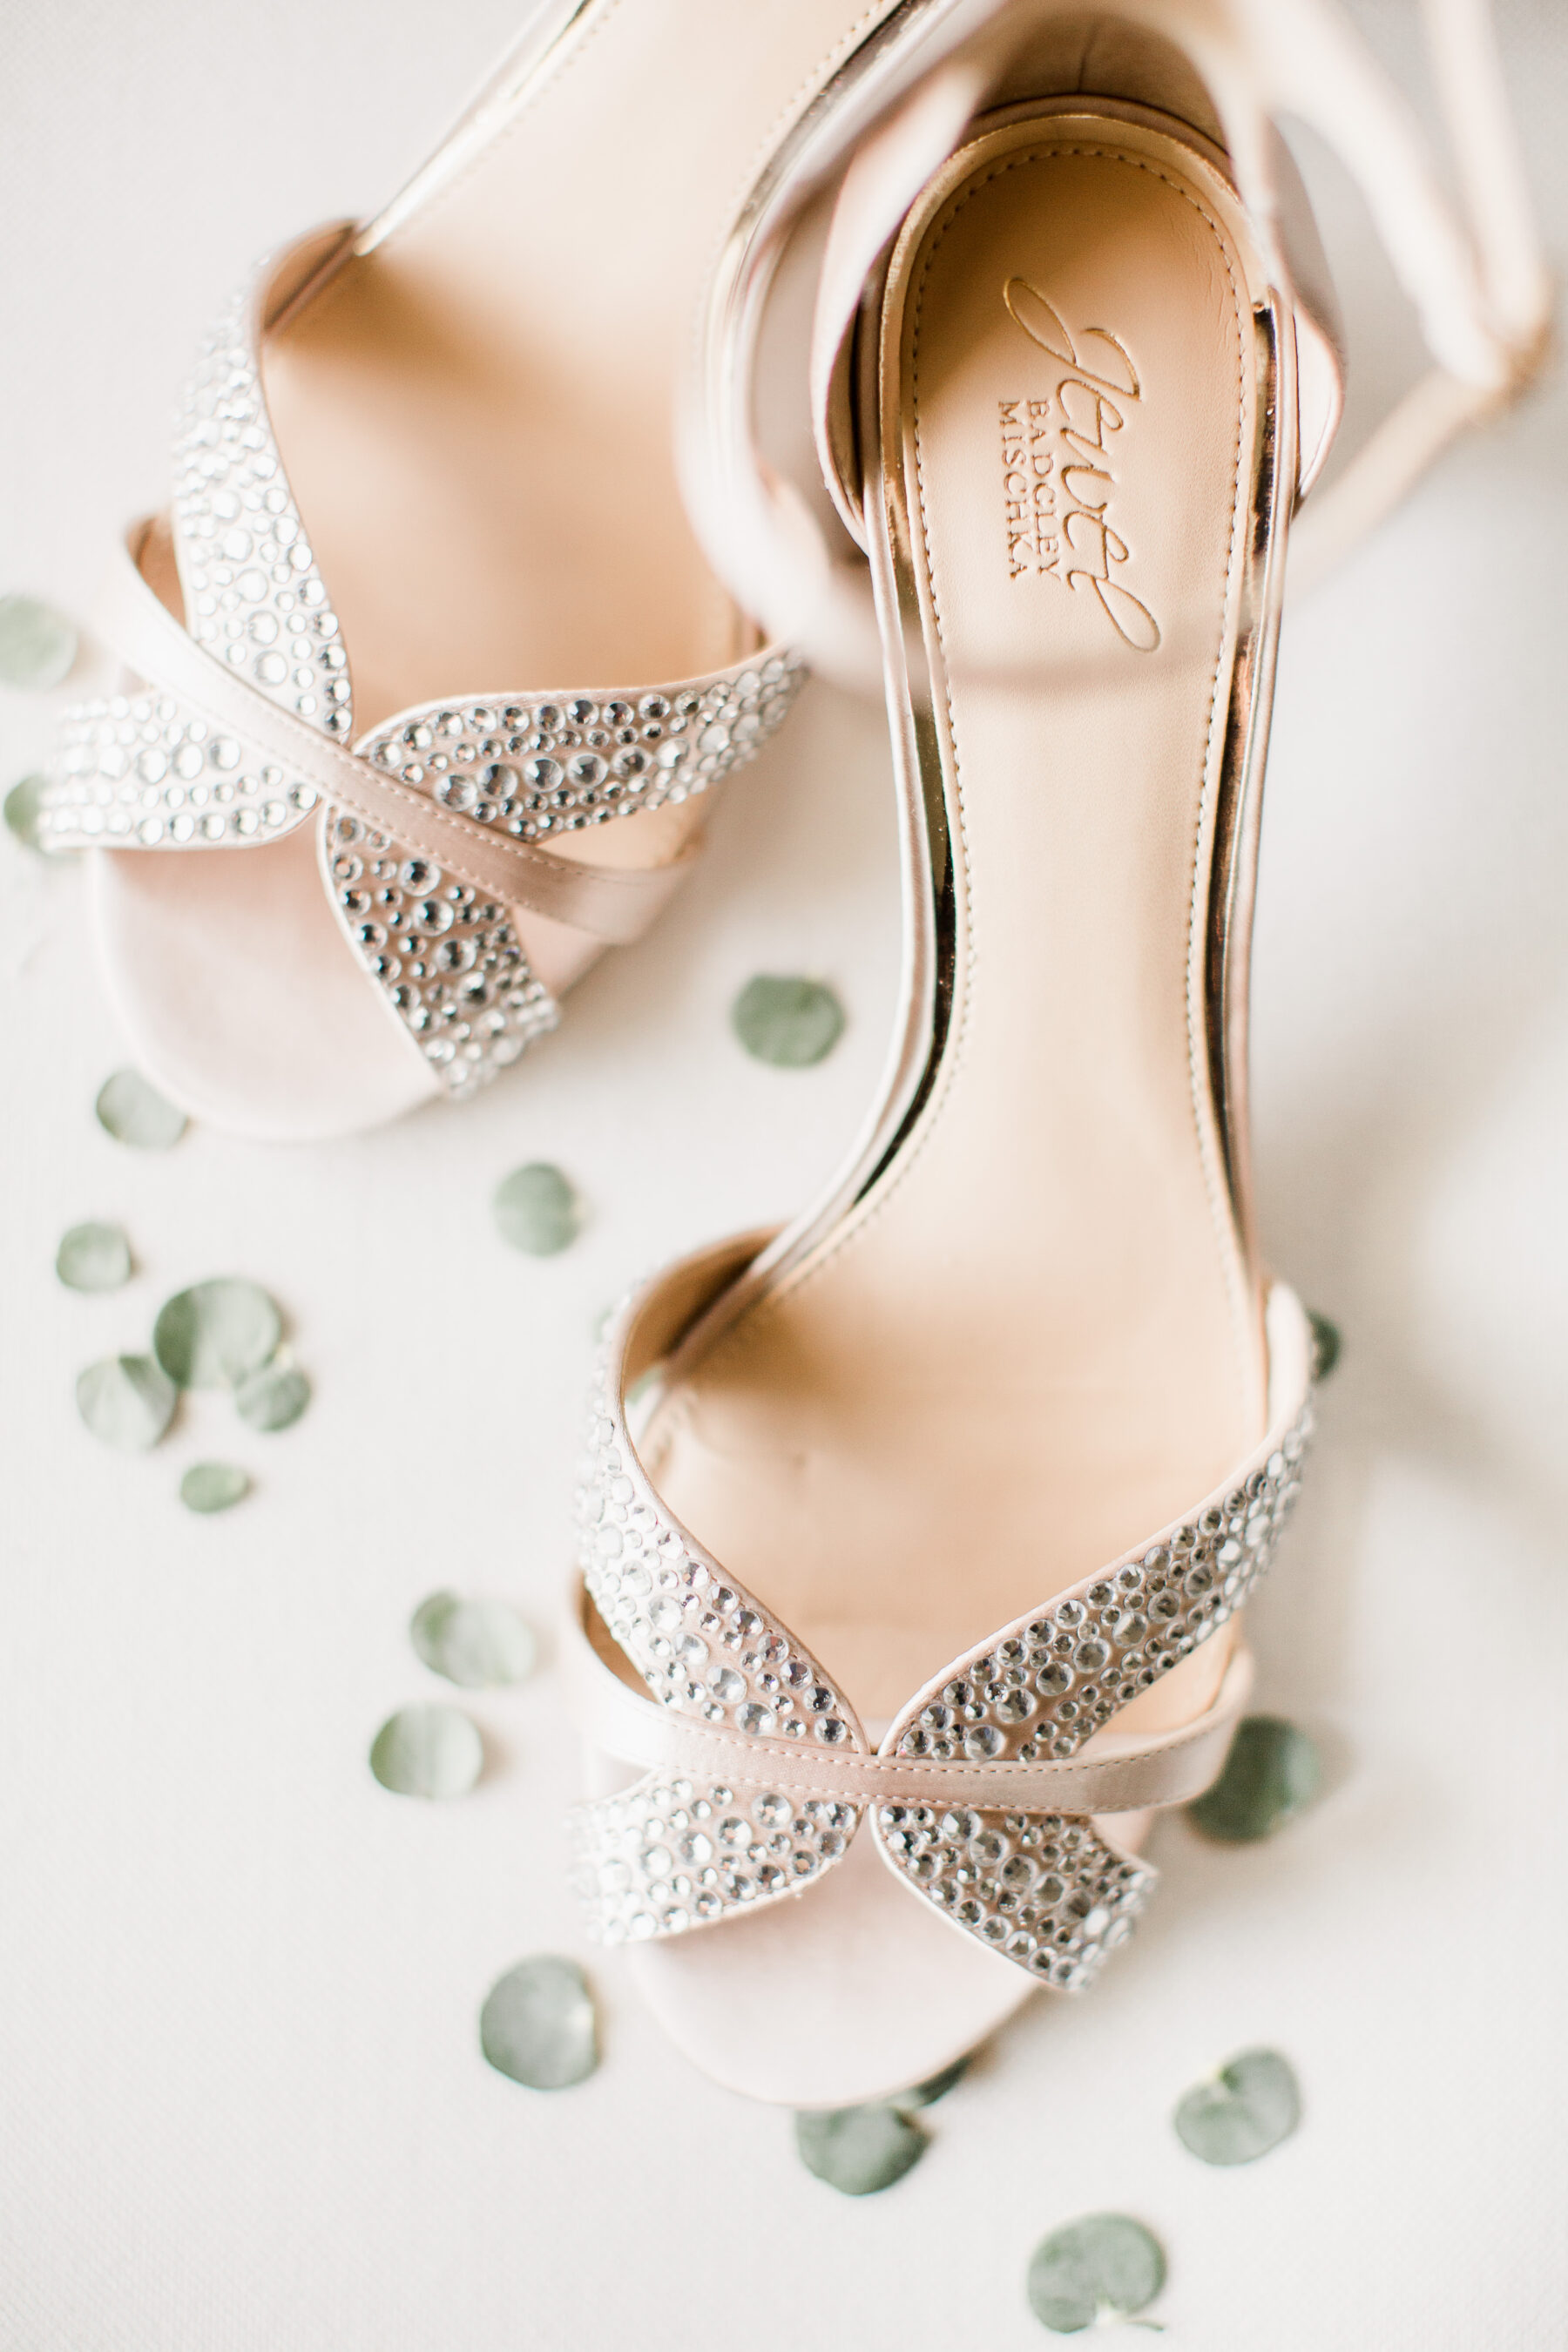 Jewel Badgley Mischka wedding shoes   Nashville Bride Guide